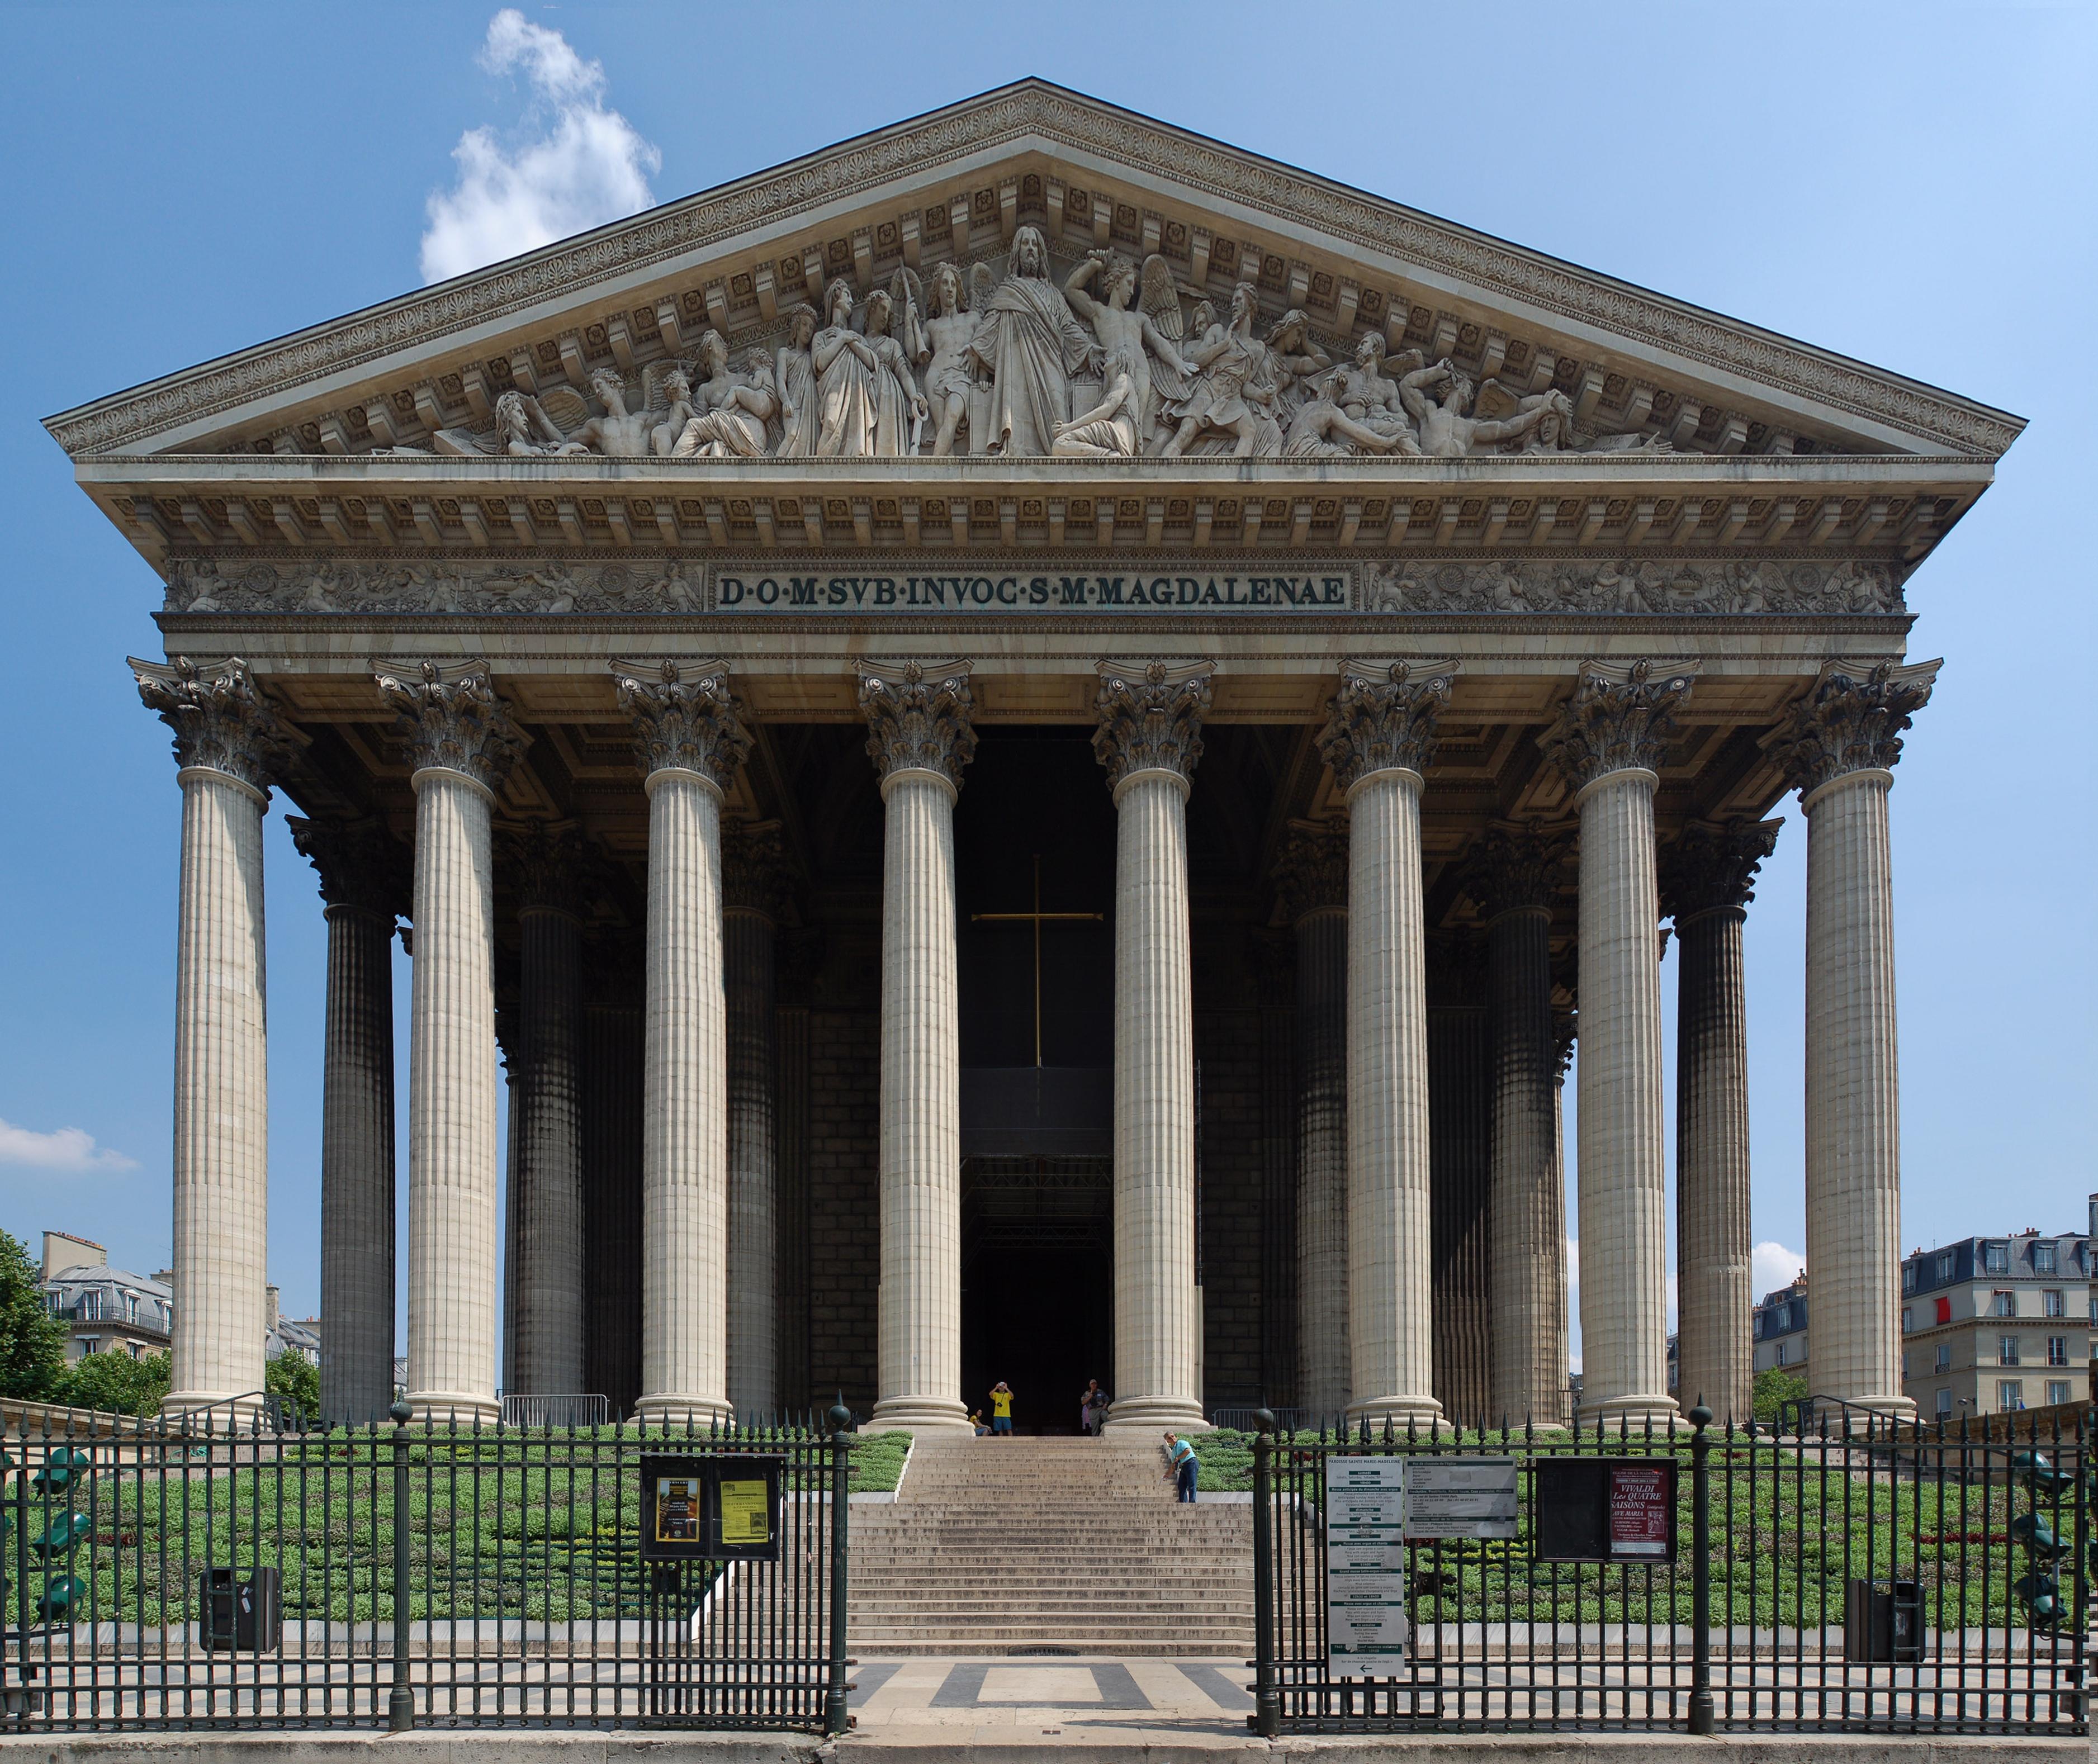 eglise de la madeleine in paris a temple to the glory of napoleon s grande armee